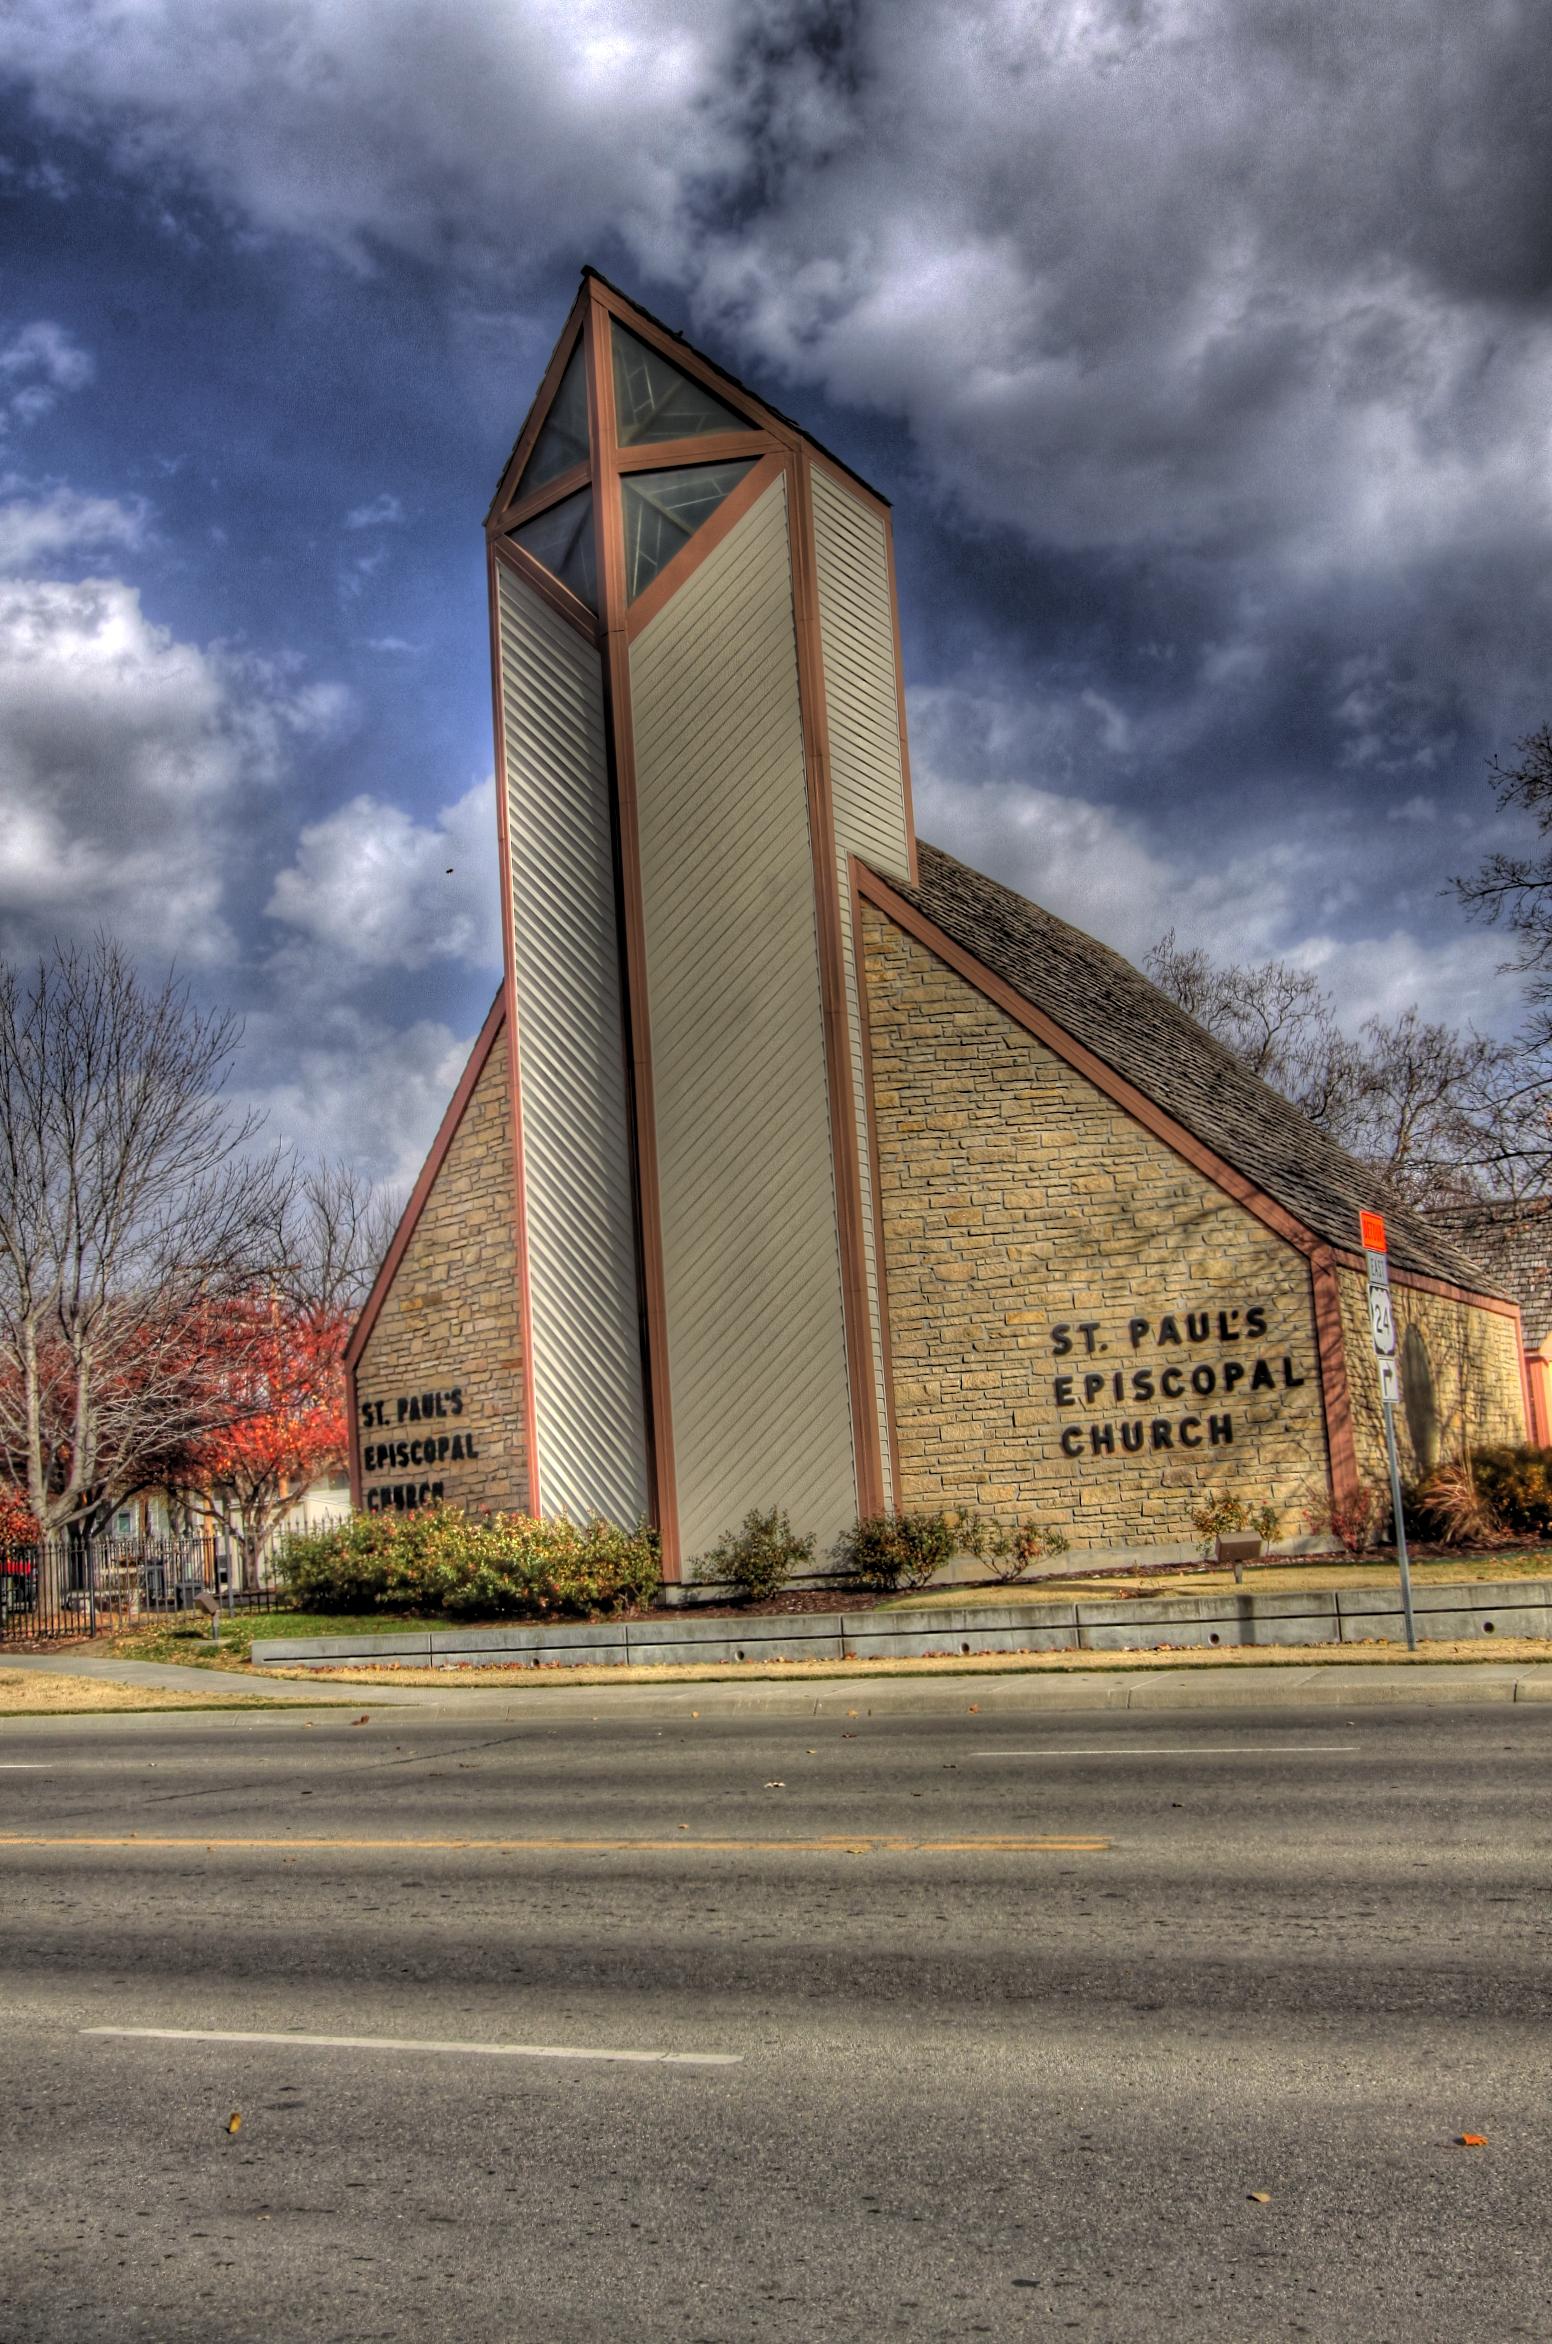 St. Paul's Episcopal Church 1